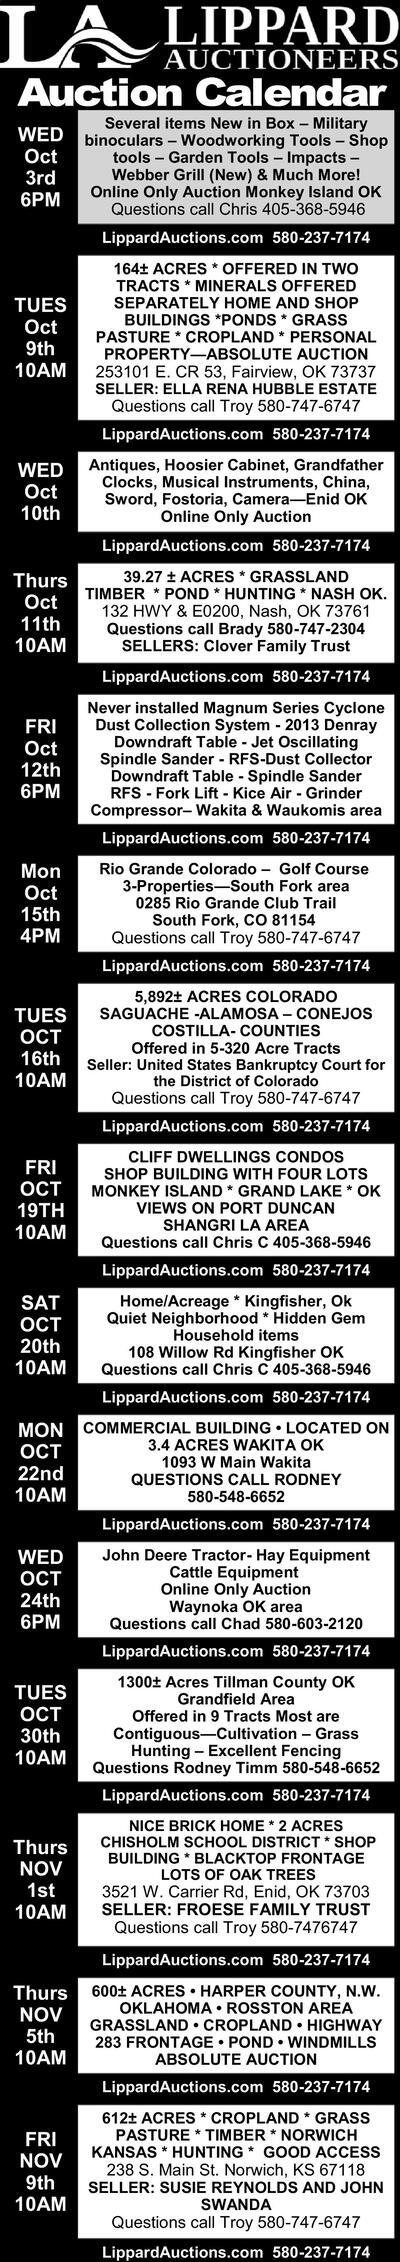 The Joplin Globe | Classifieds | Announcements